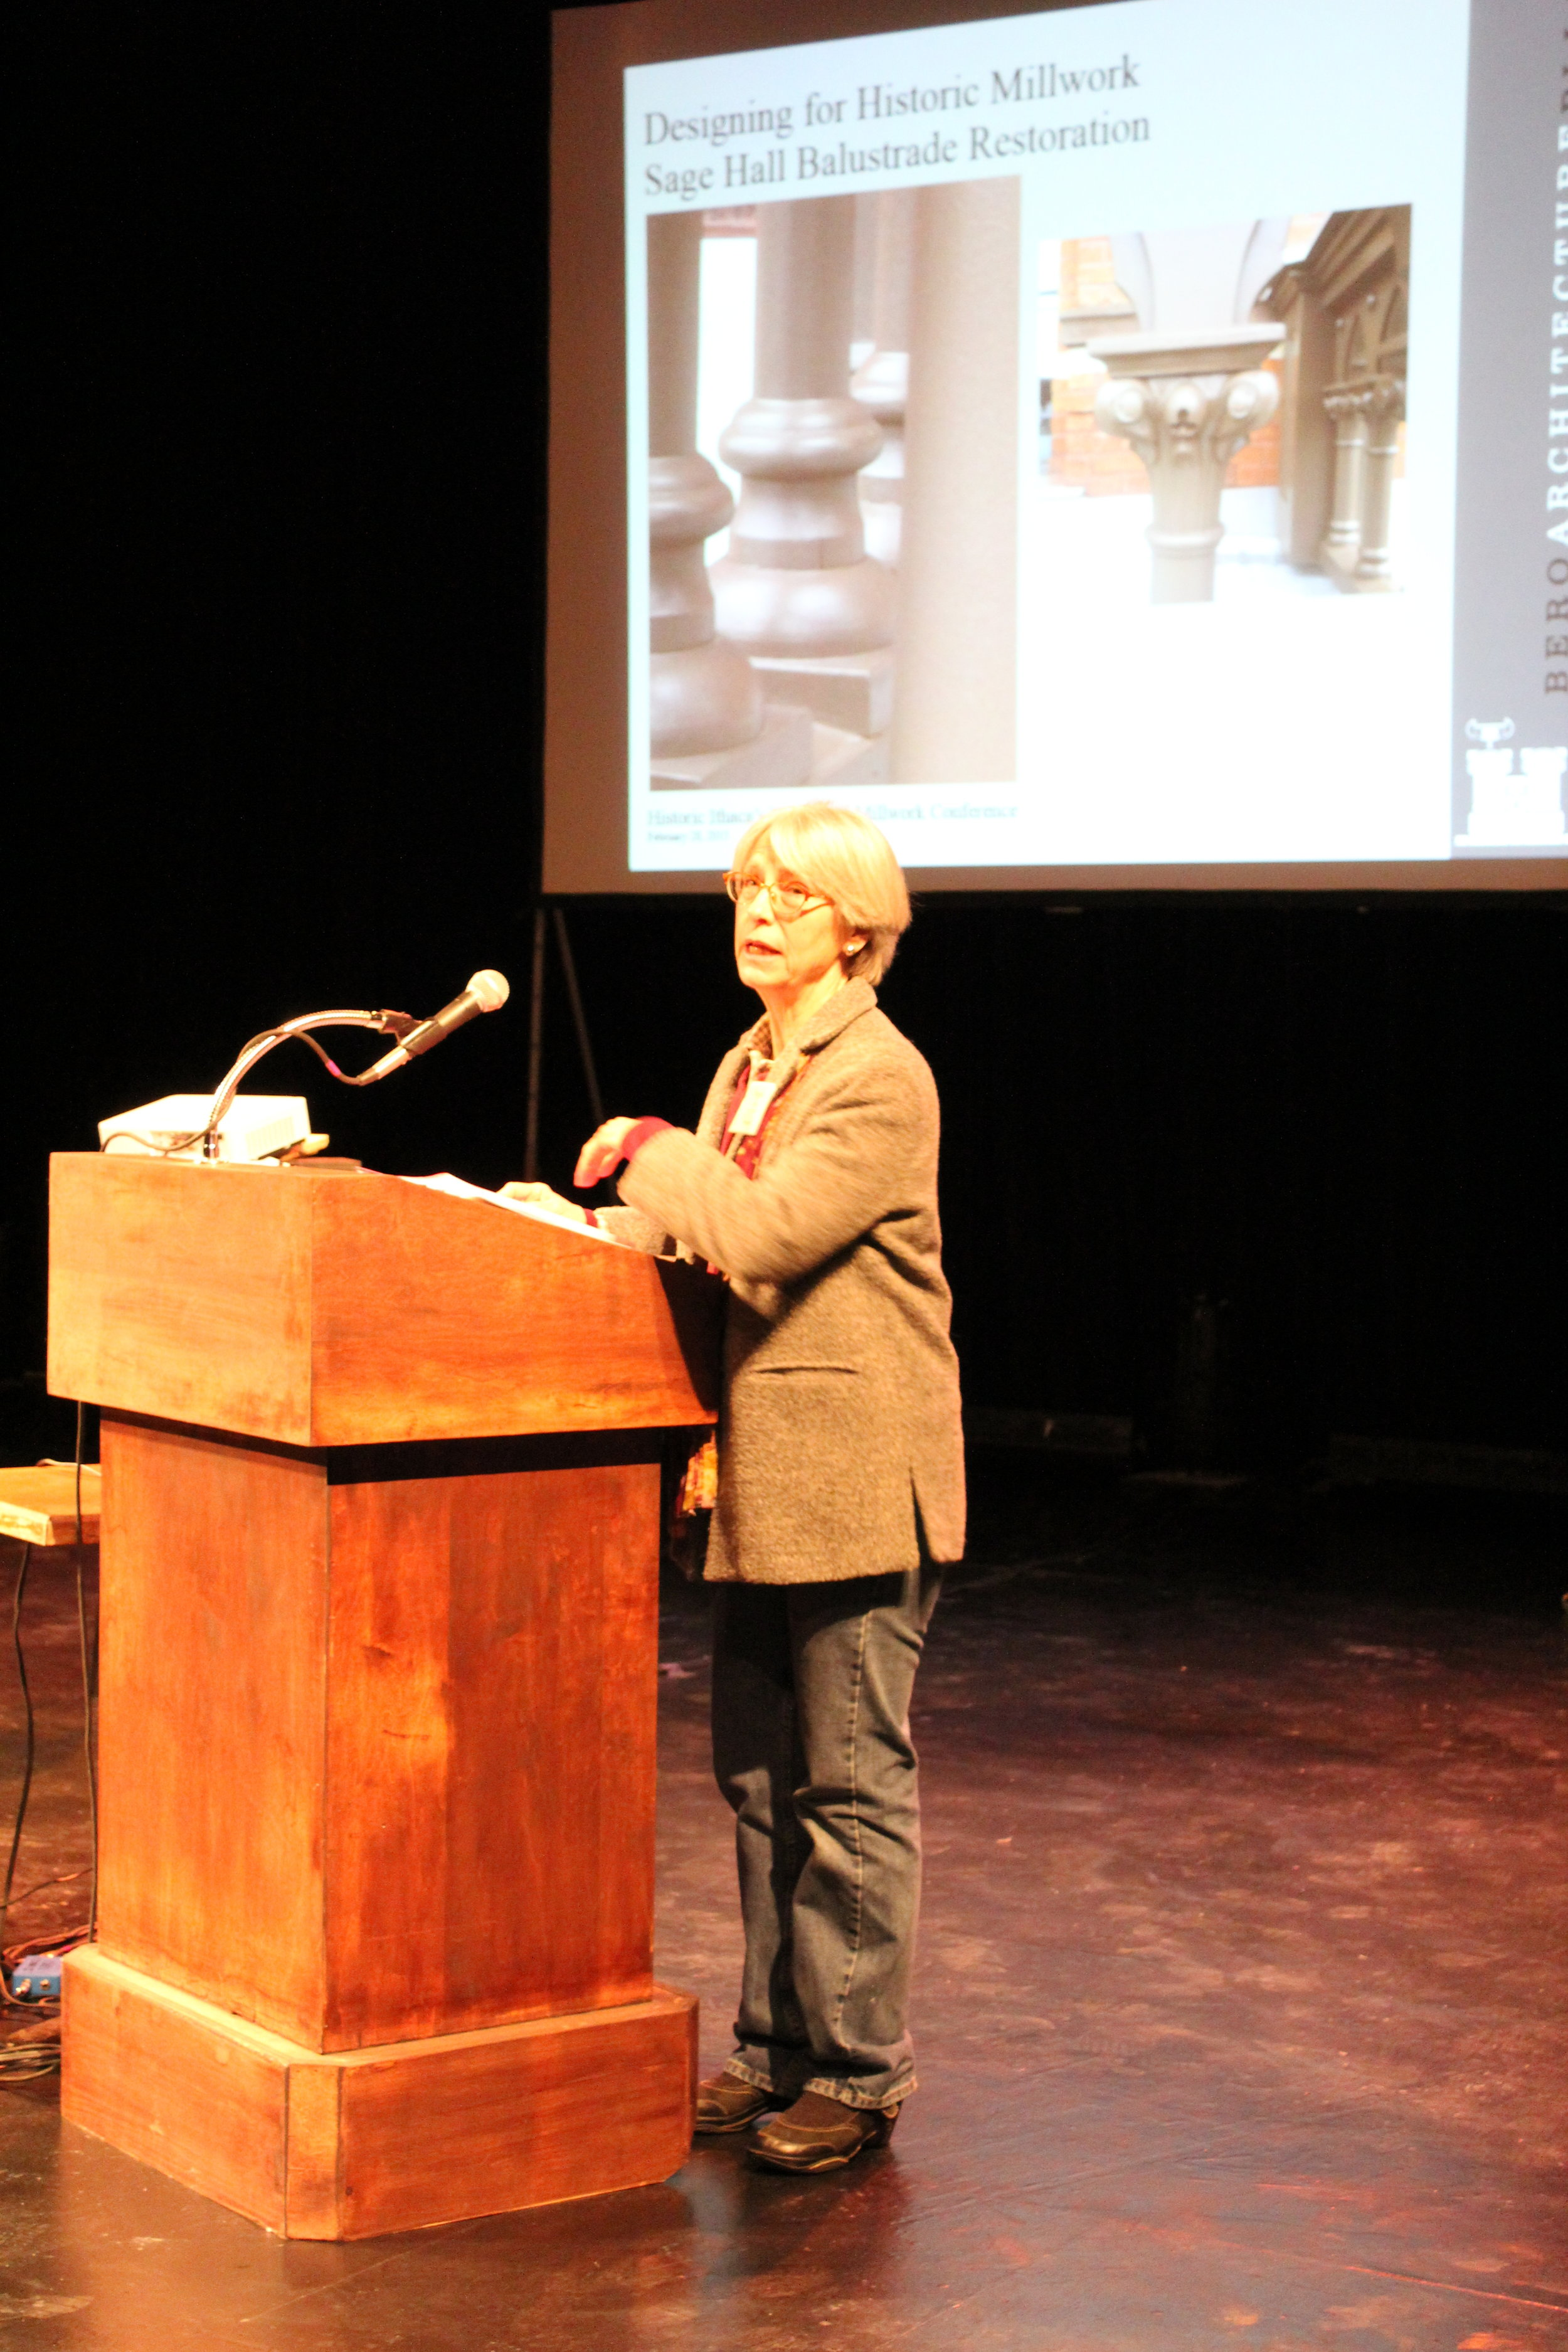 2015-HPEF-PiT-Historic Ithaca-Virginia Searl keynote on Sage Hall balustrades.jpg